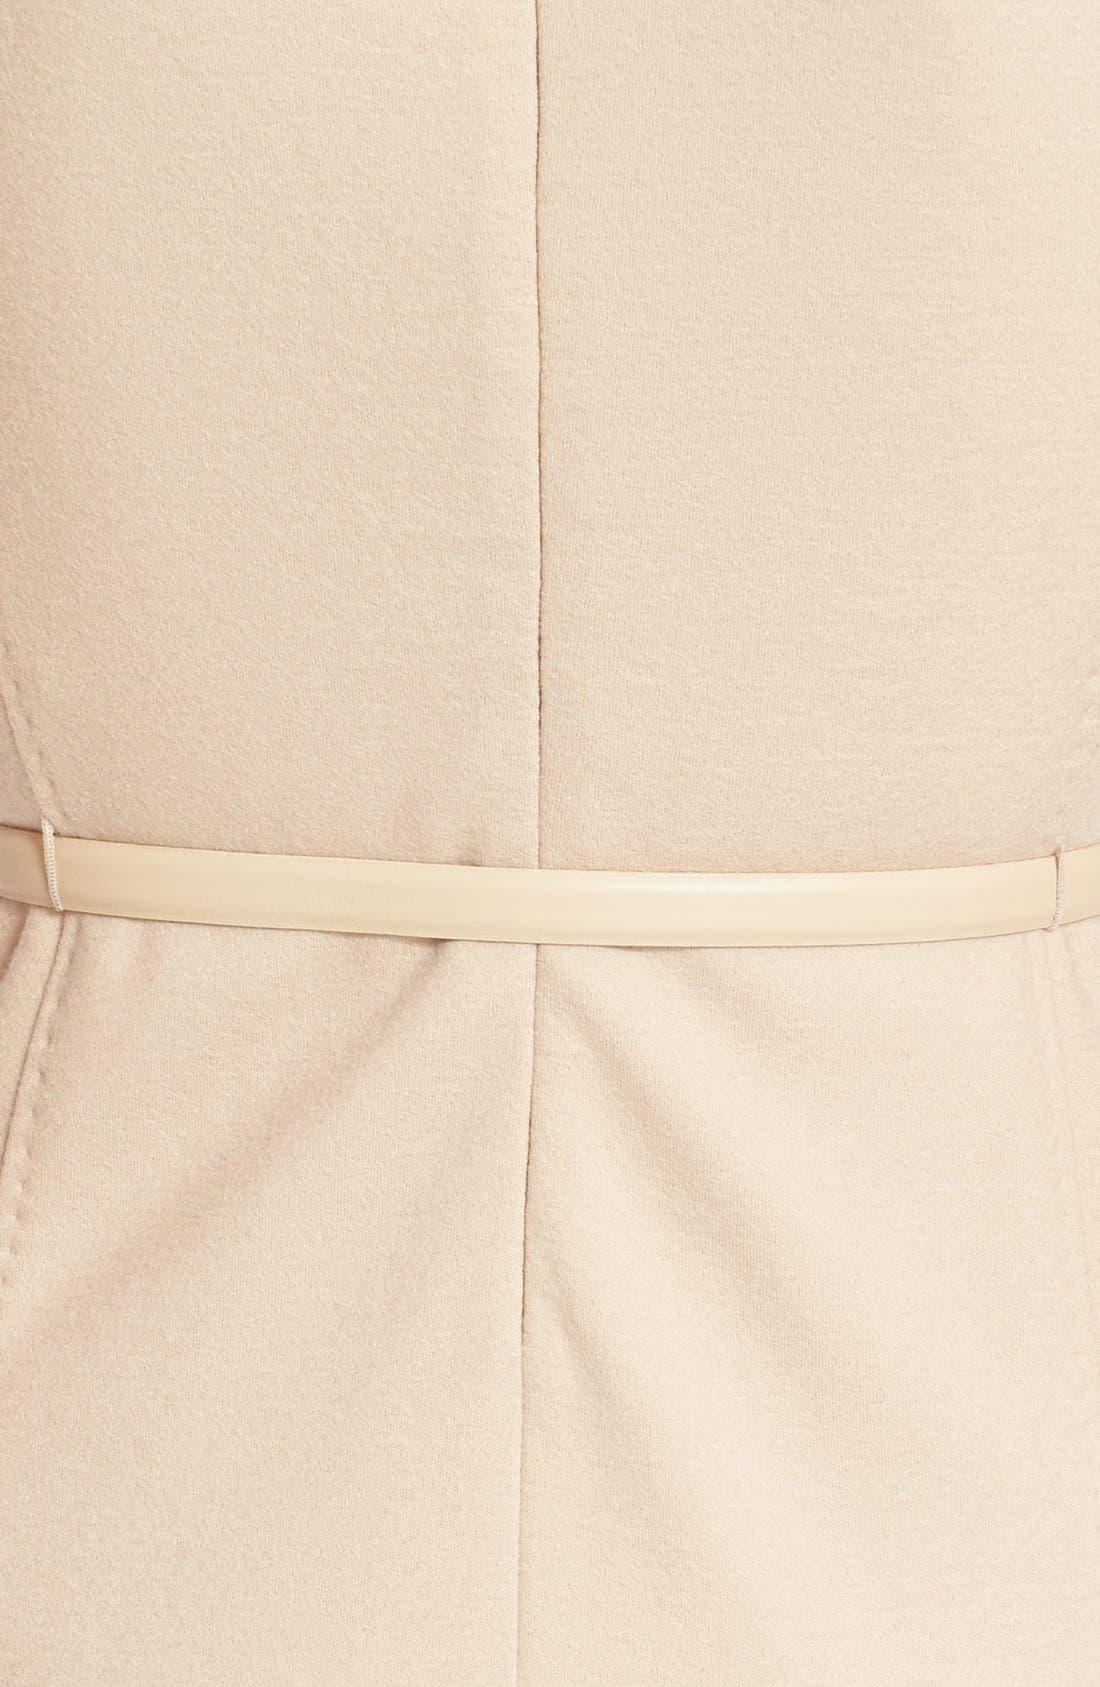 Alternate Image 3  - Max Mara 'Rabbino' Wool Jersey Sheath Dress